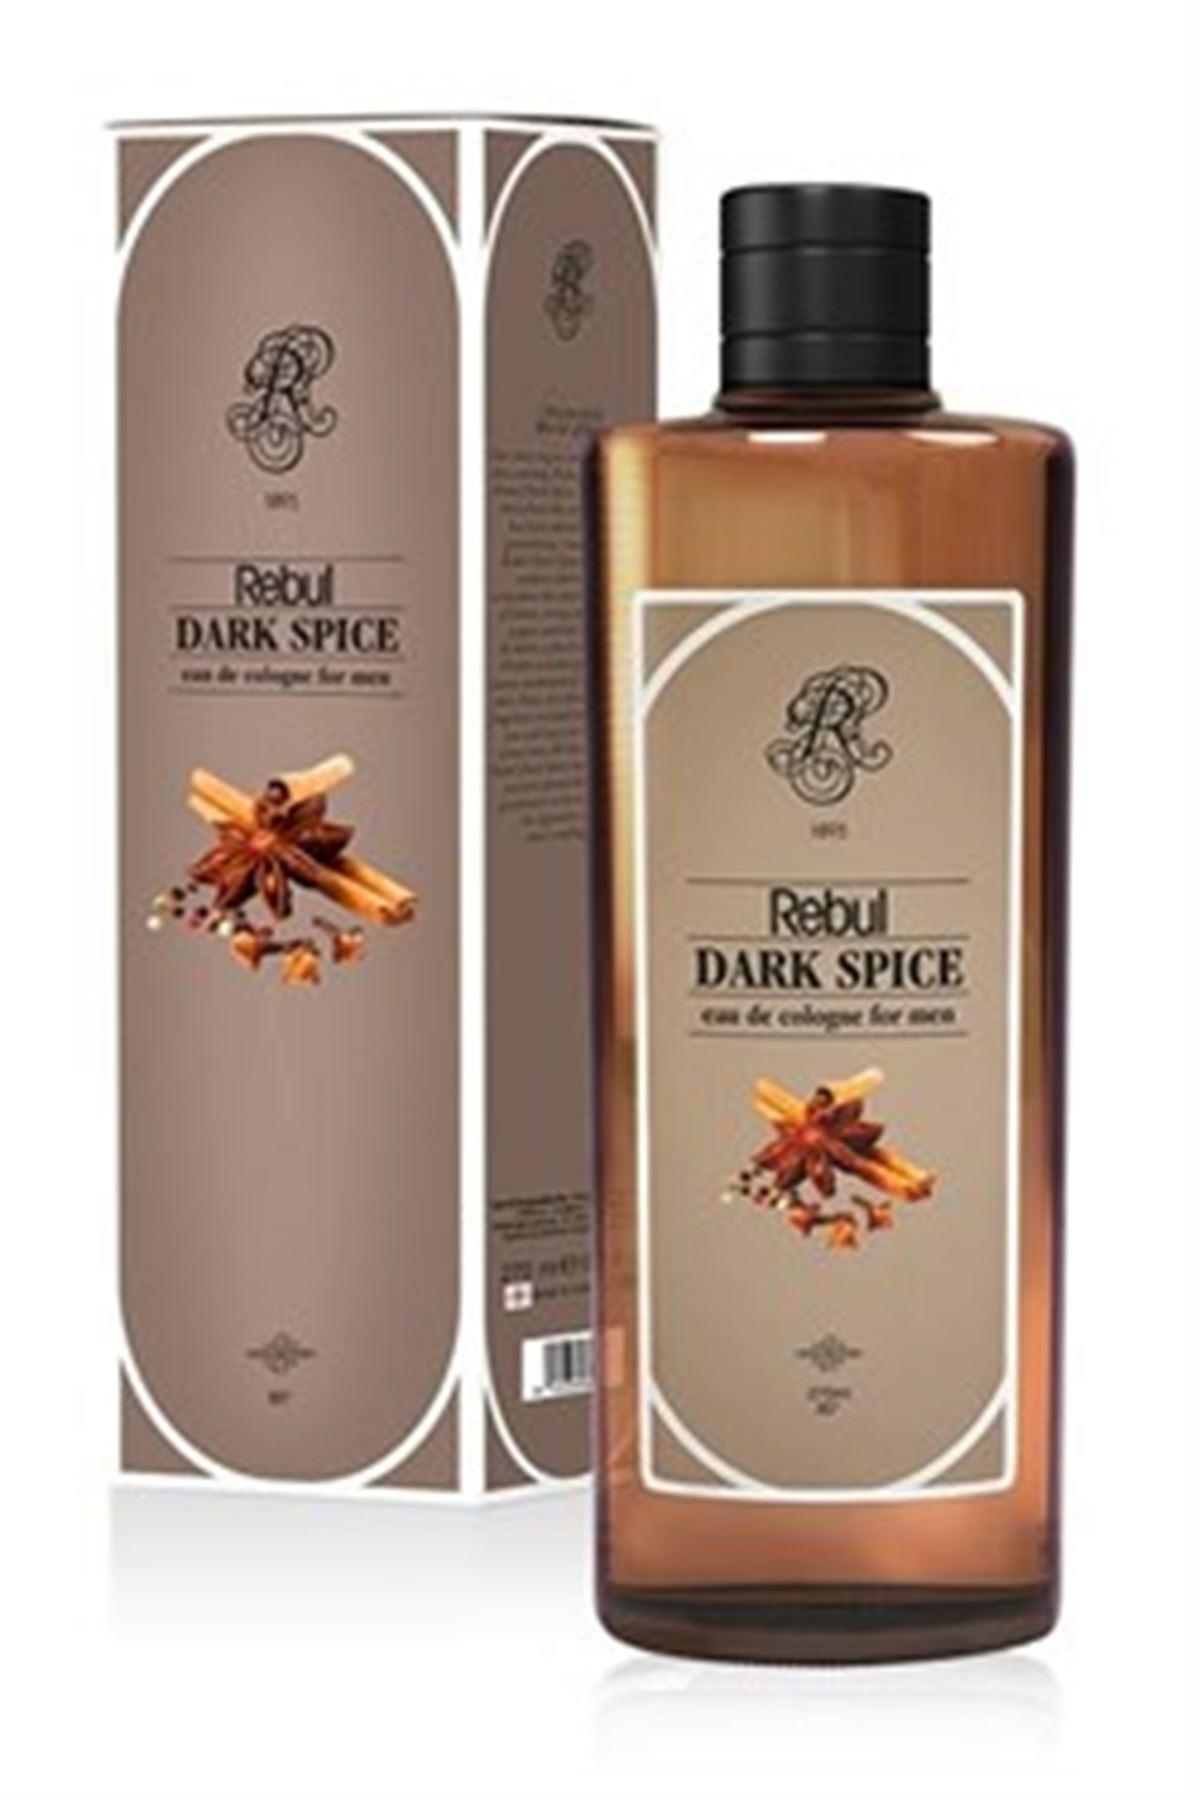 Rebul Dark Spice 270 ML Cam Şişe